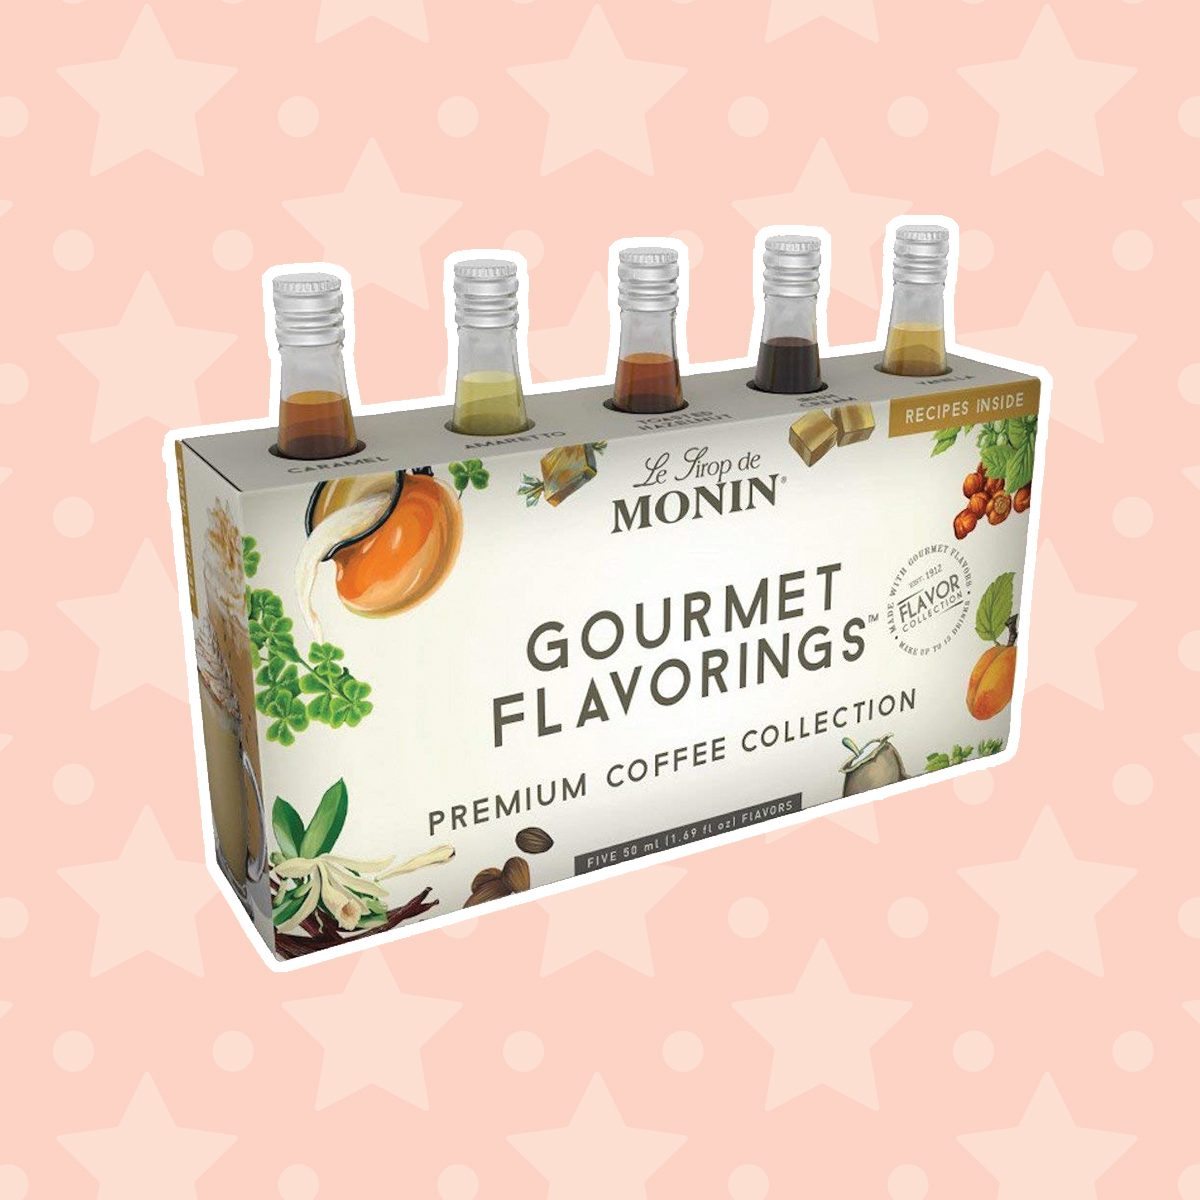 Monin Gourmet Flavorings Premium Coffee Collection